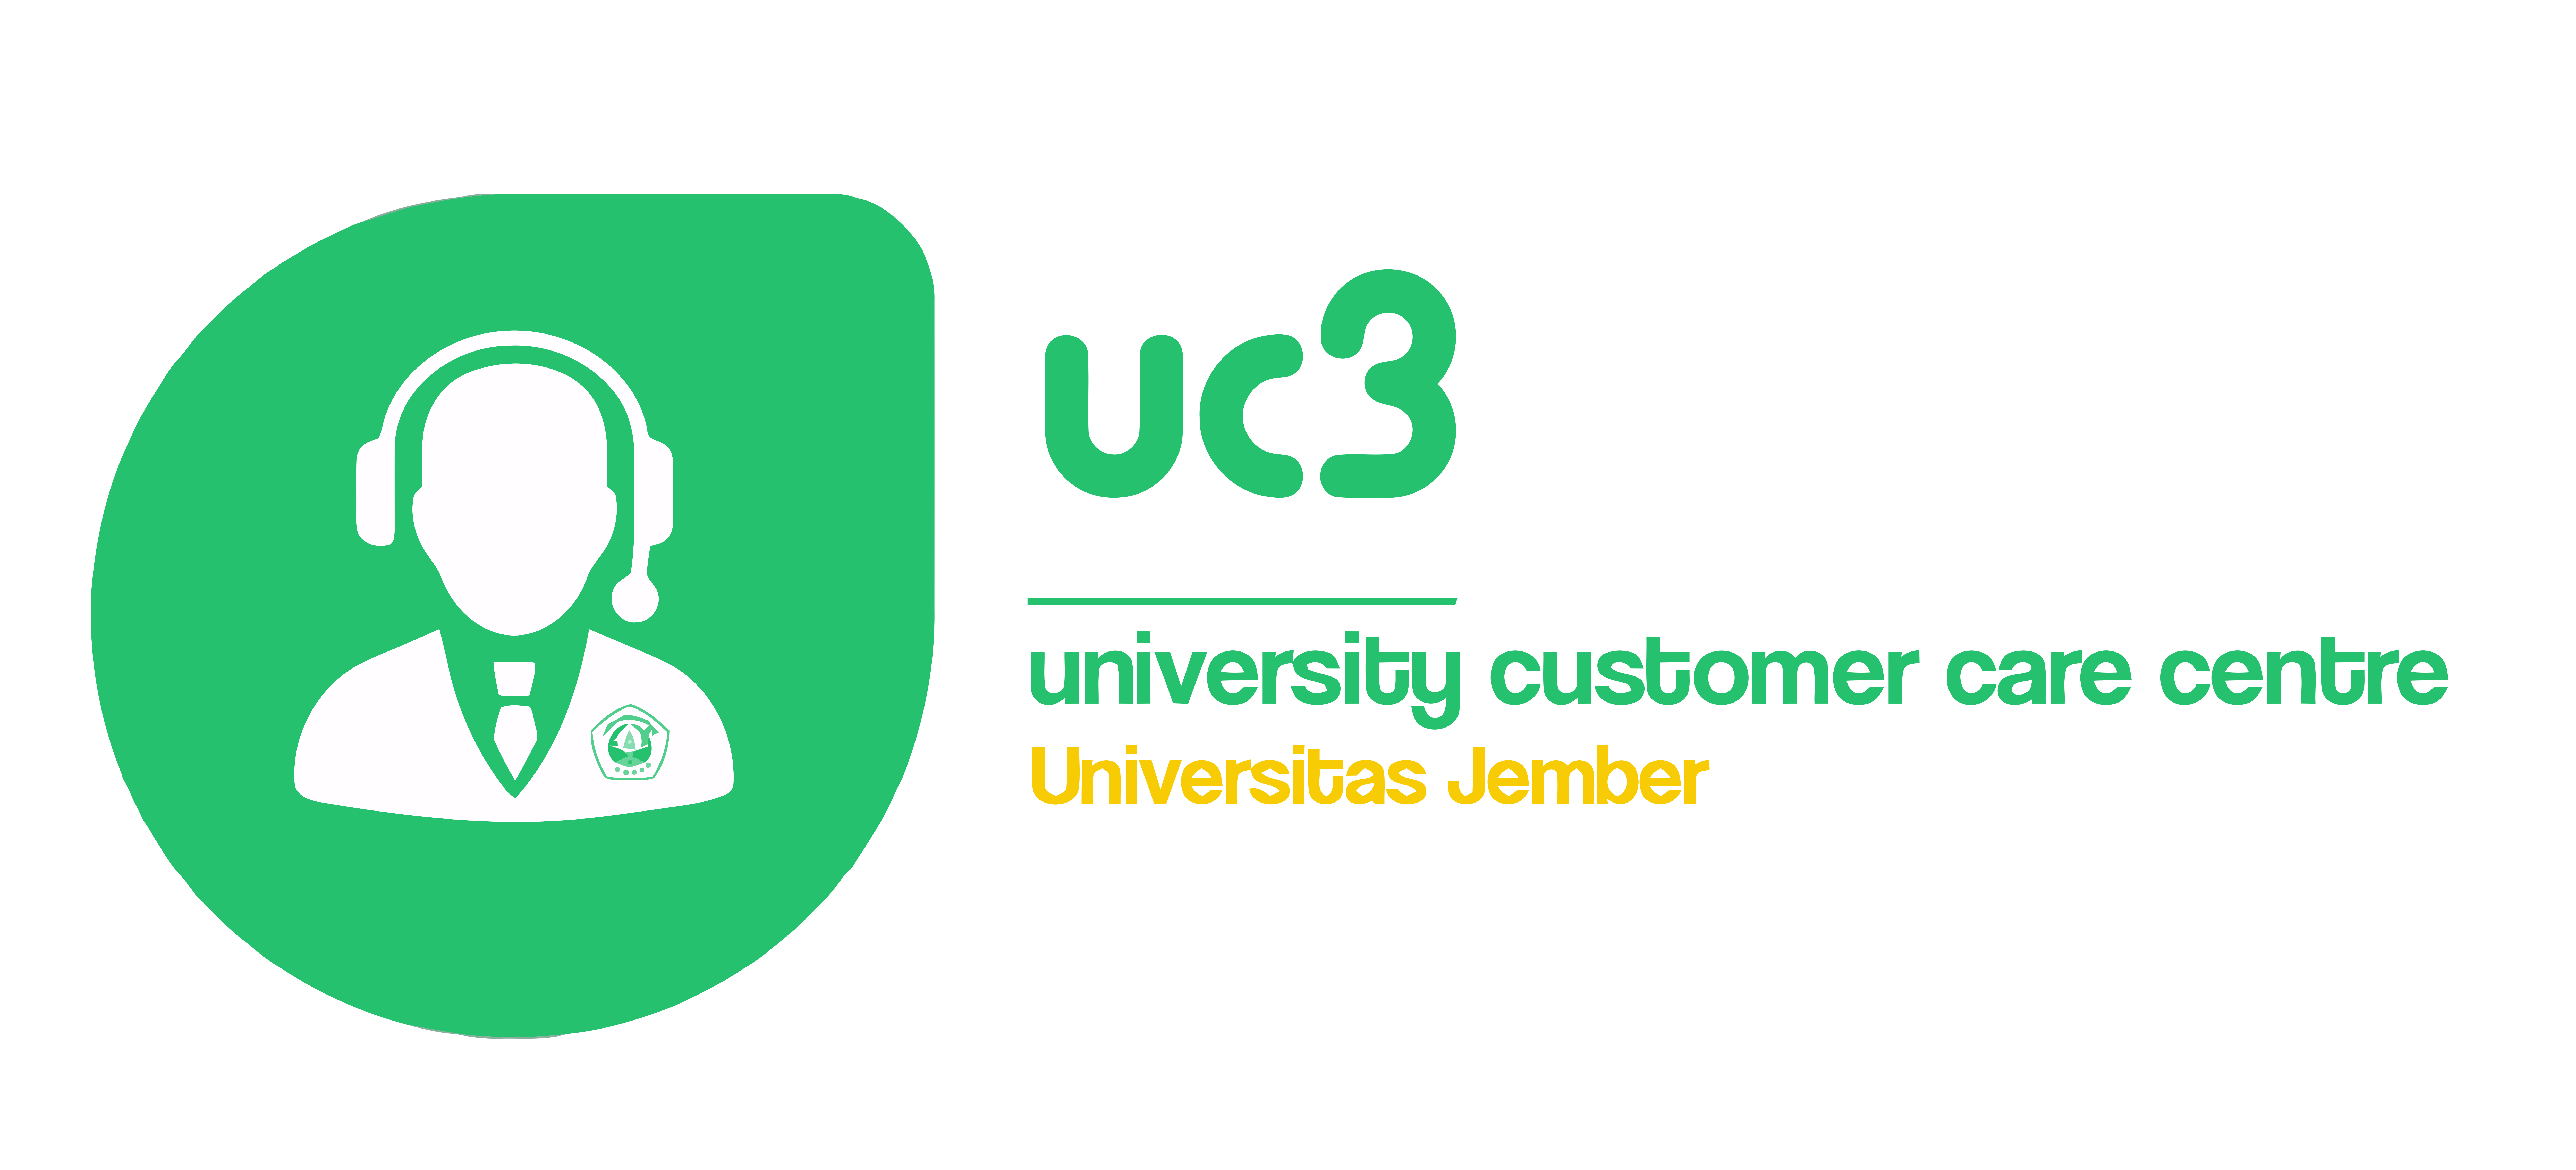 uc3 universitas jember uc3 universitas jember